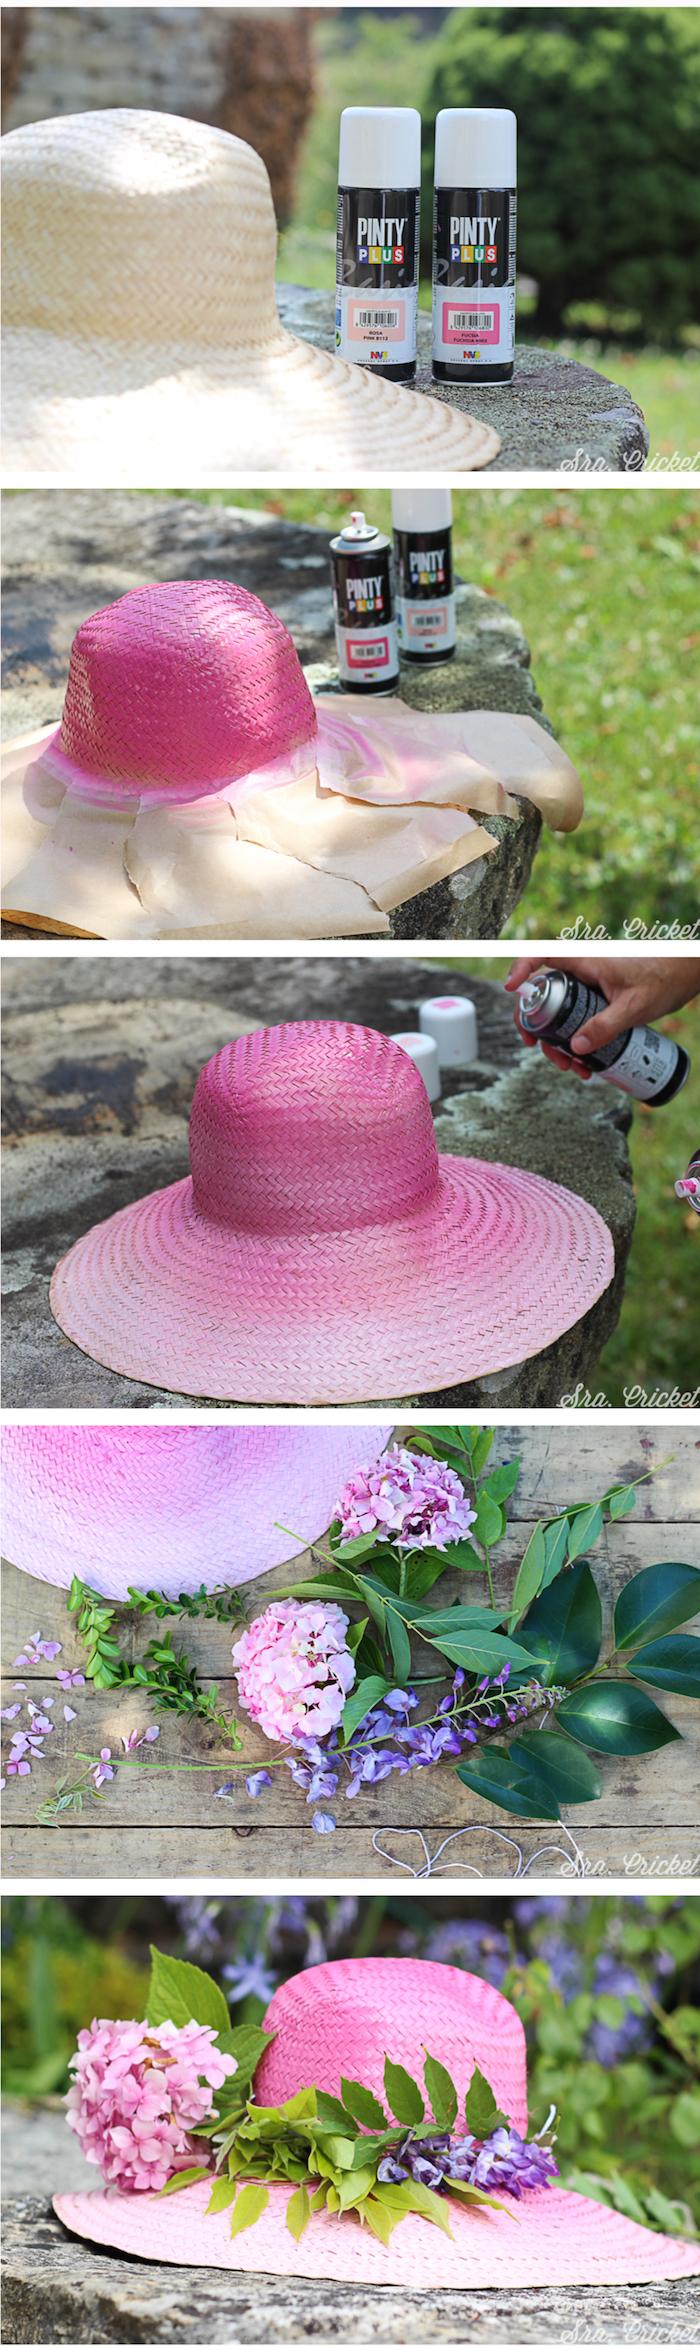 tutorial-sombrero-pintado-con-spray